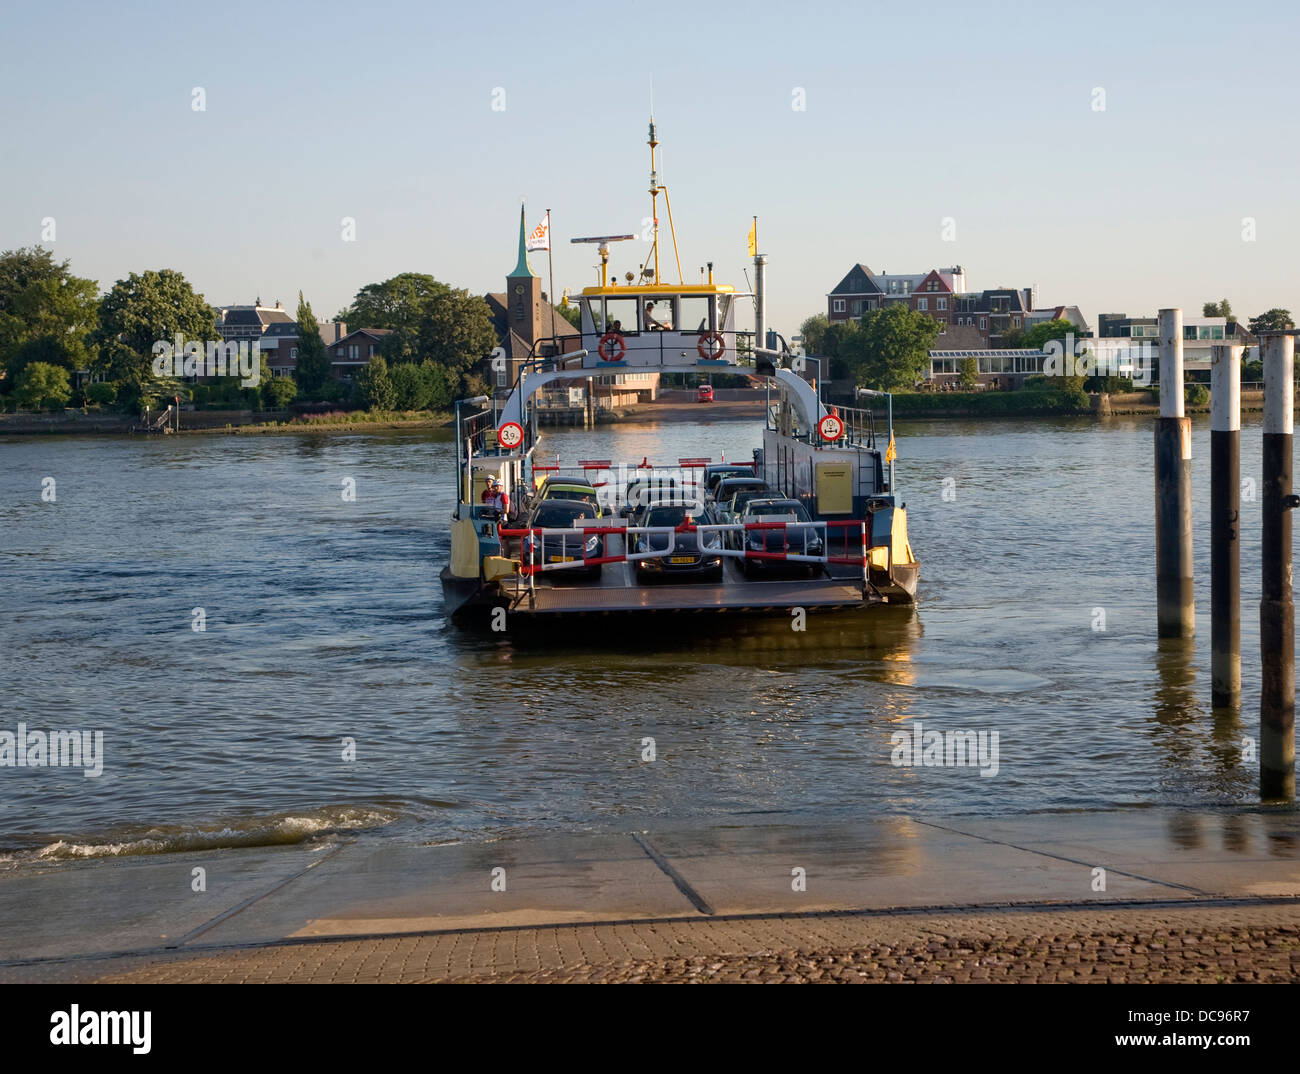 Car ferry arriving at Kinderdijk across the River Lek from Krimpen aan de Lek Netherlands - Stock Image